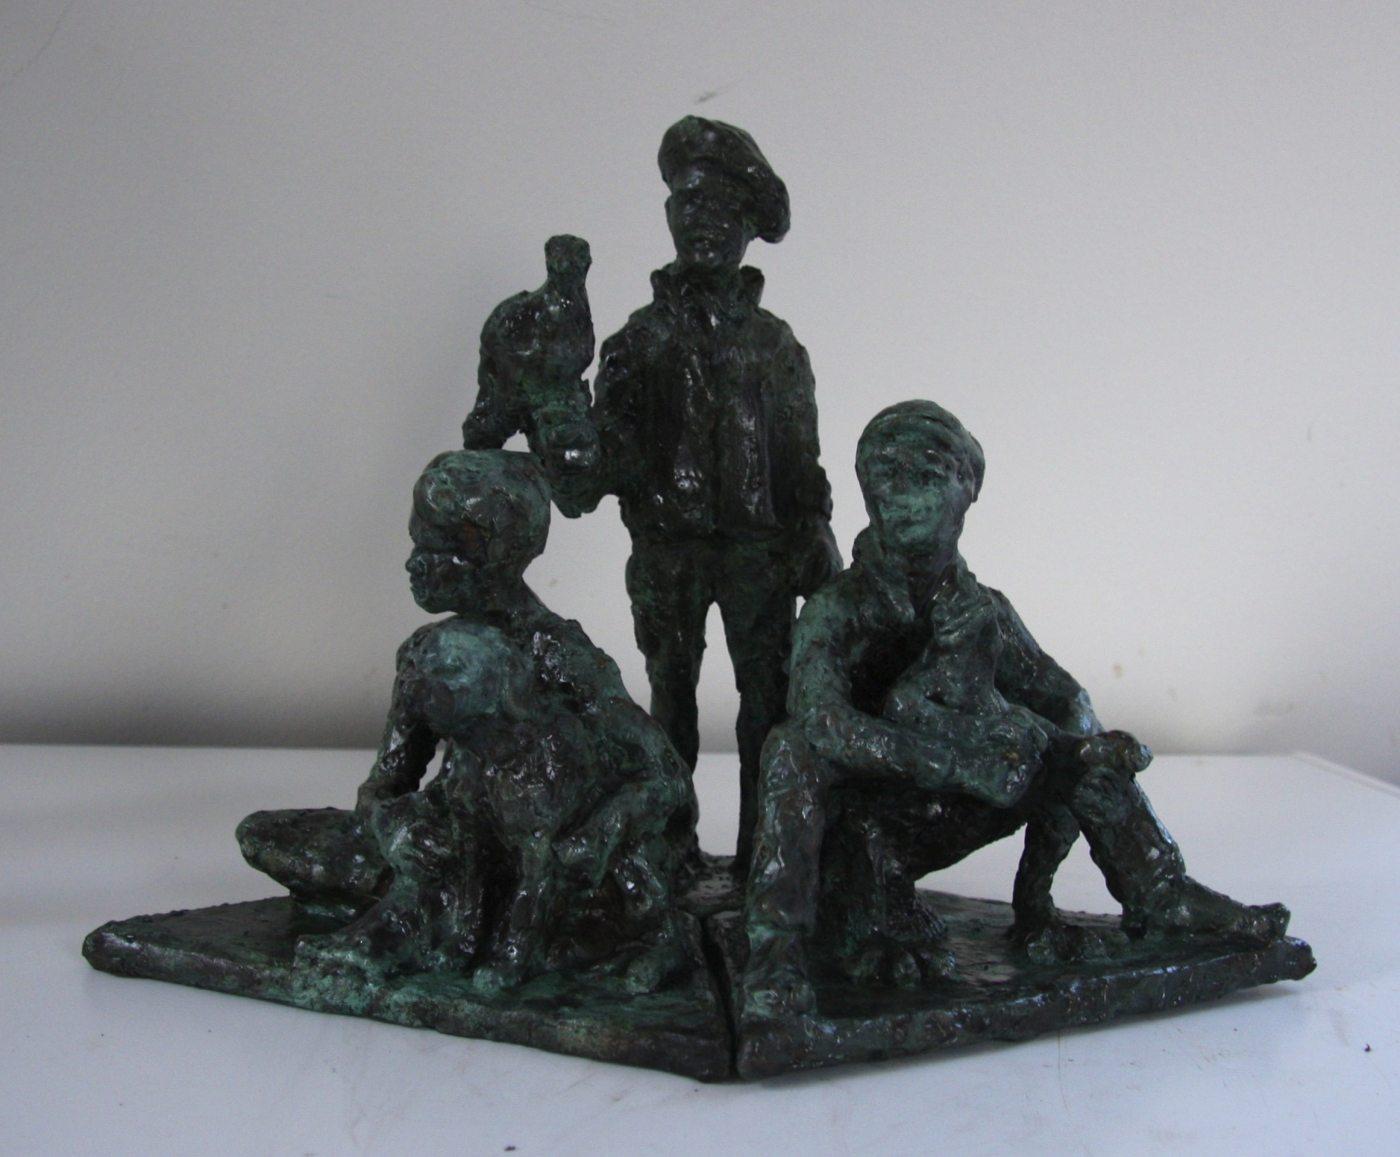 3 Drenge, ed. 8, h 30cm